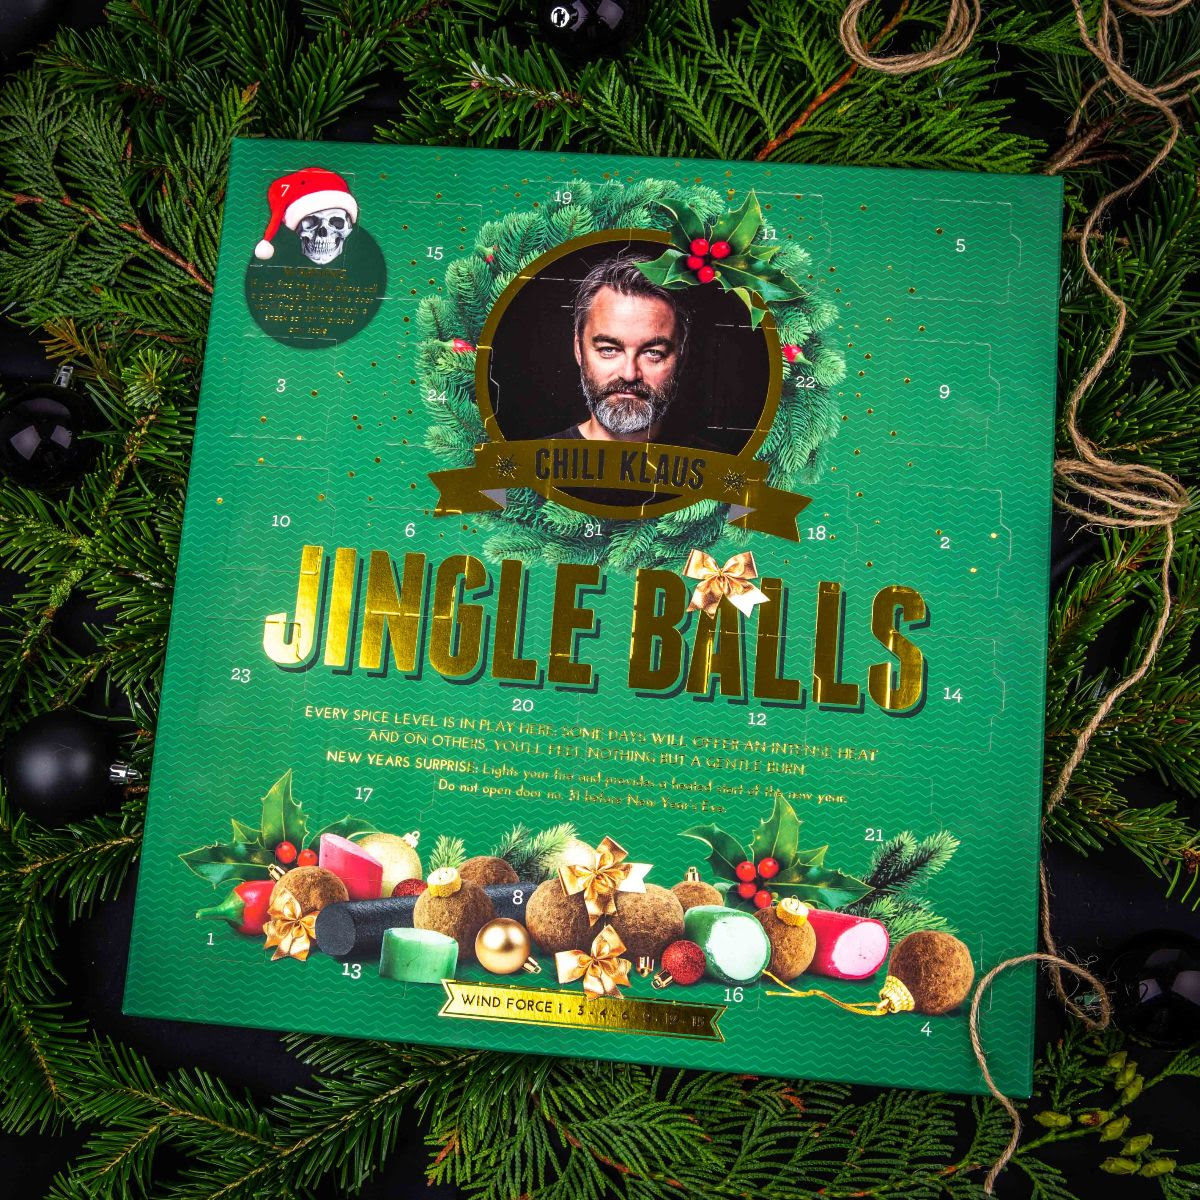 Julkalender Chilipraliner - Chili Klaus (Adventskalender 2019) • Pryloteket